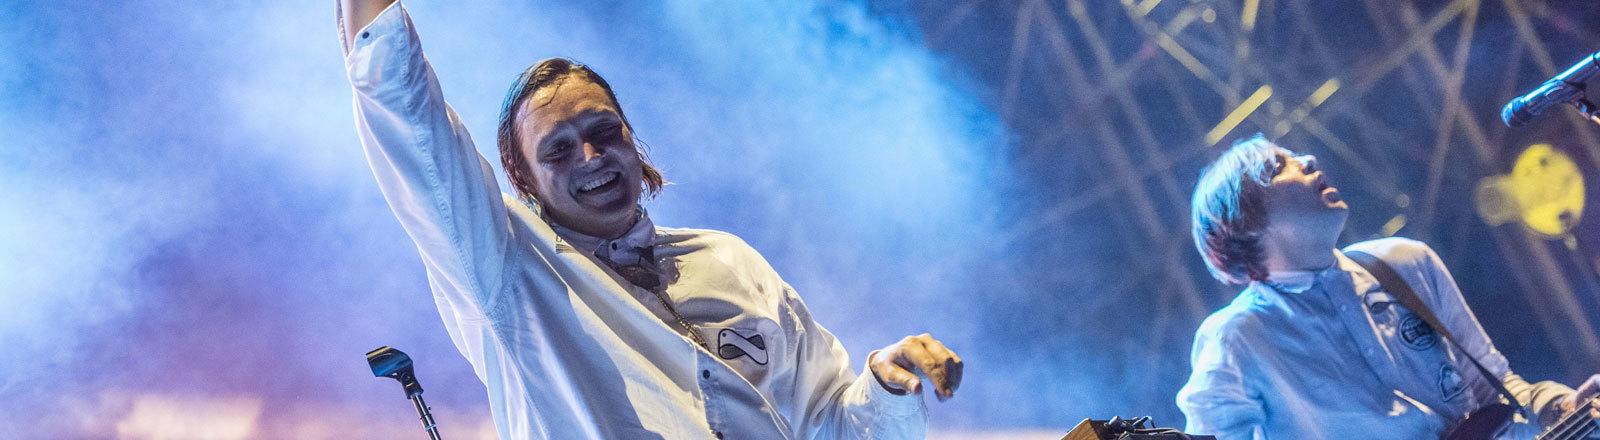 Arcade Fire 17.07.2017 in Mailand